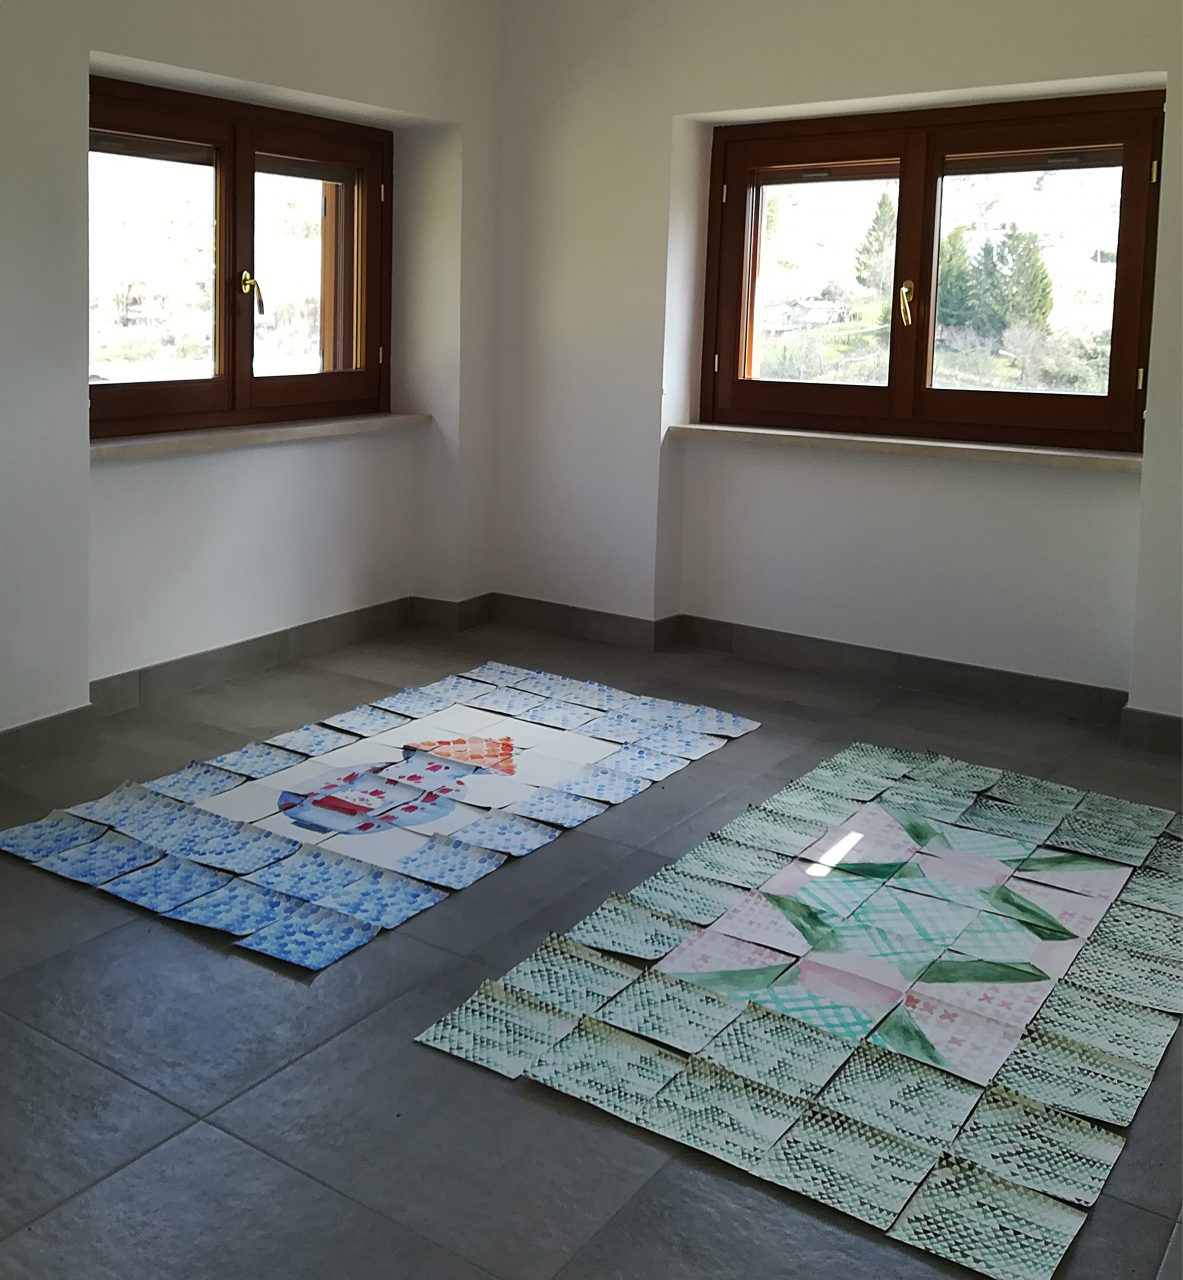 Presentation Olevano Romano, Villa Massimo, Academy of Arts